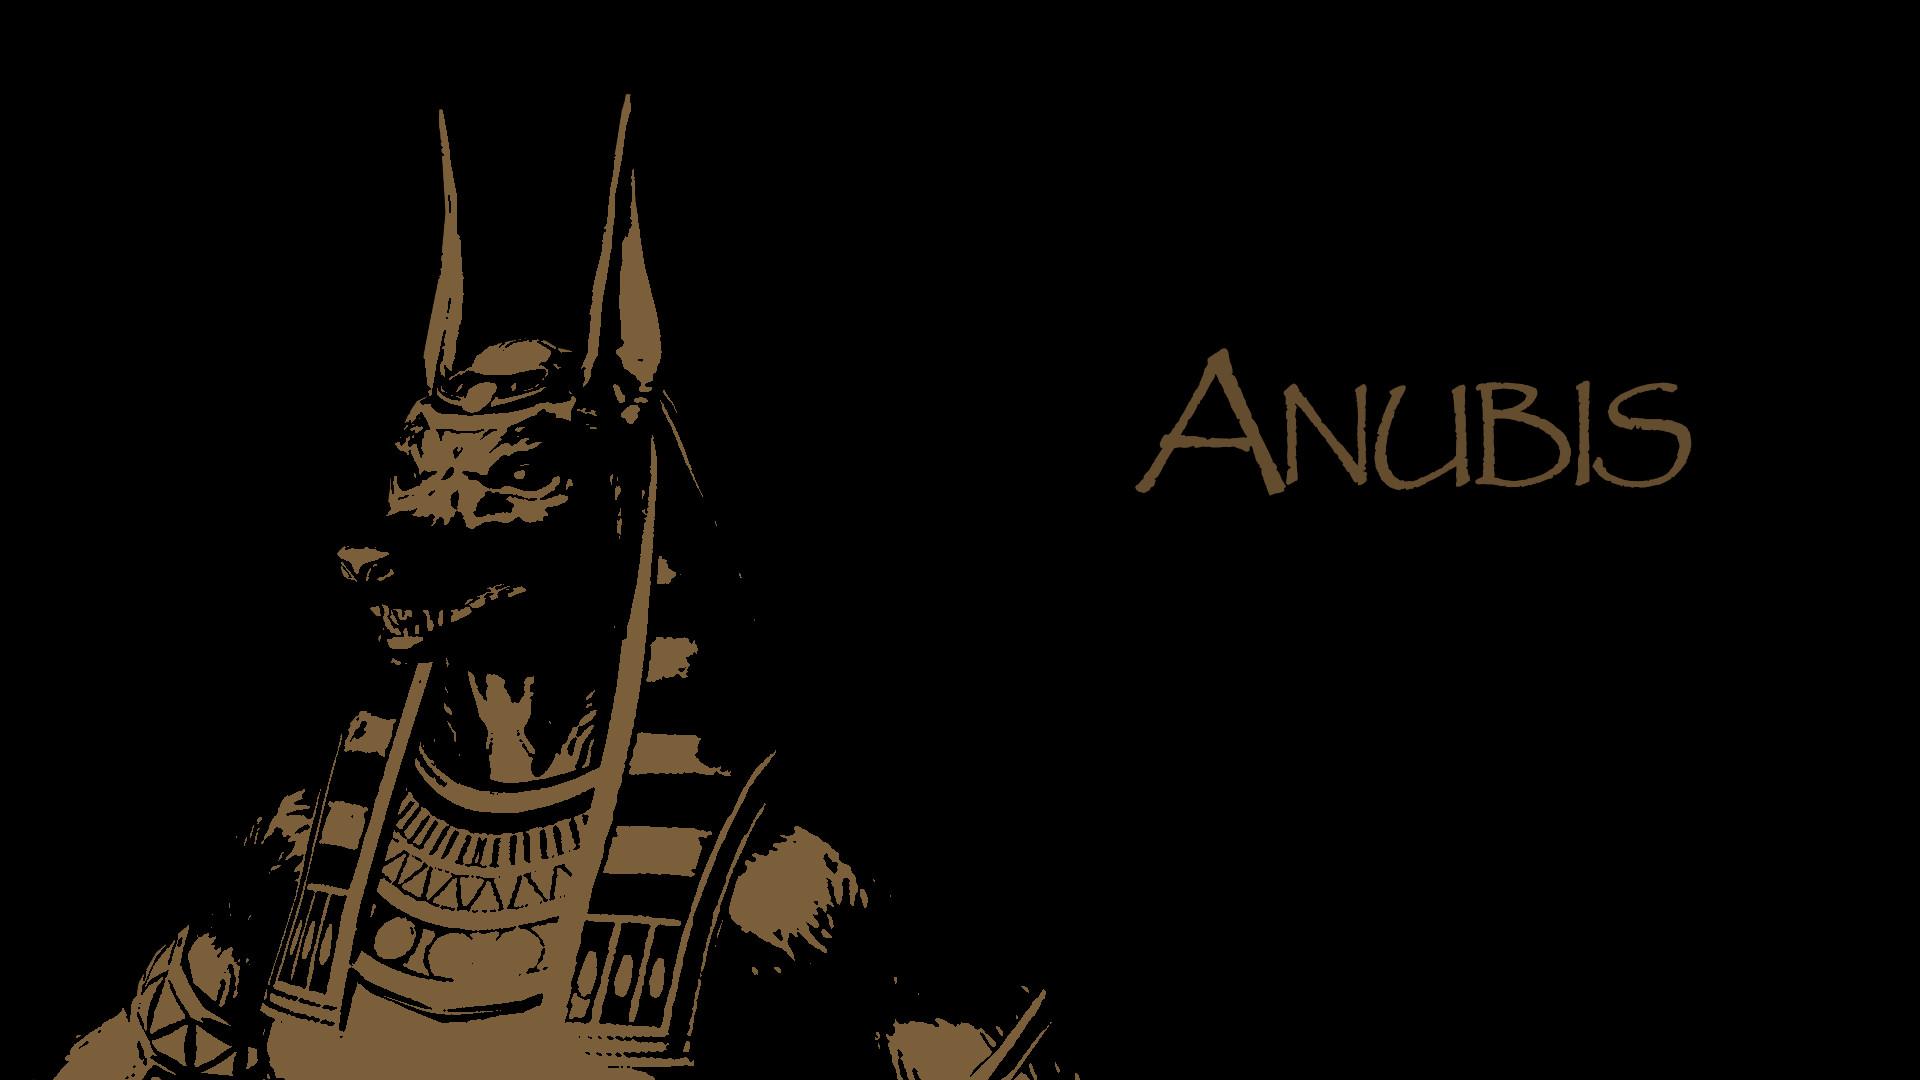 anubis egyptian god wallpaper 61 images